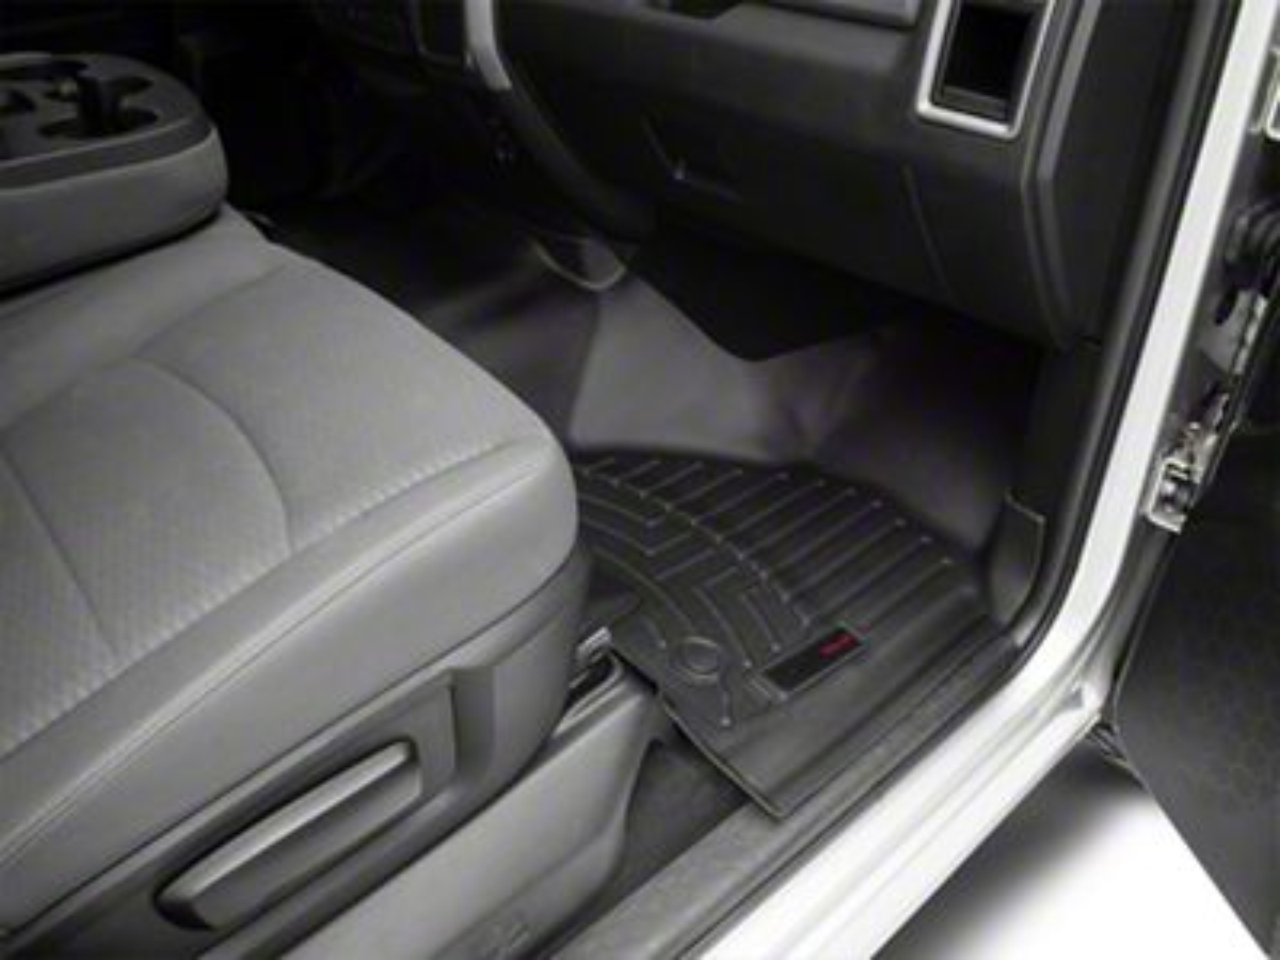 Weathertech DigitalFit Front & Rear Floor Liners - Over The Hump - Black (12-18 RAM 1500 Crew Cab w/ Vinyl Floors)